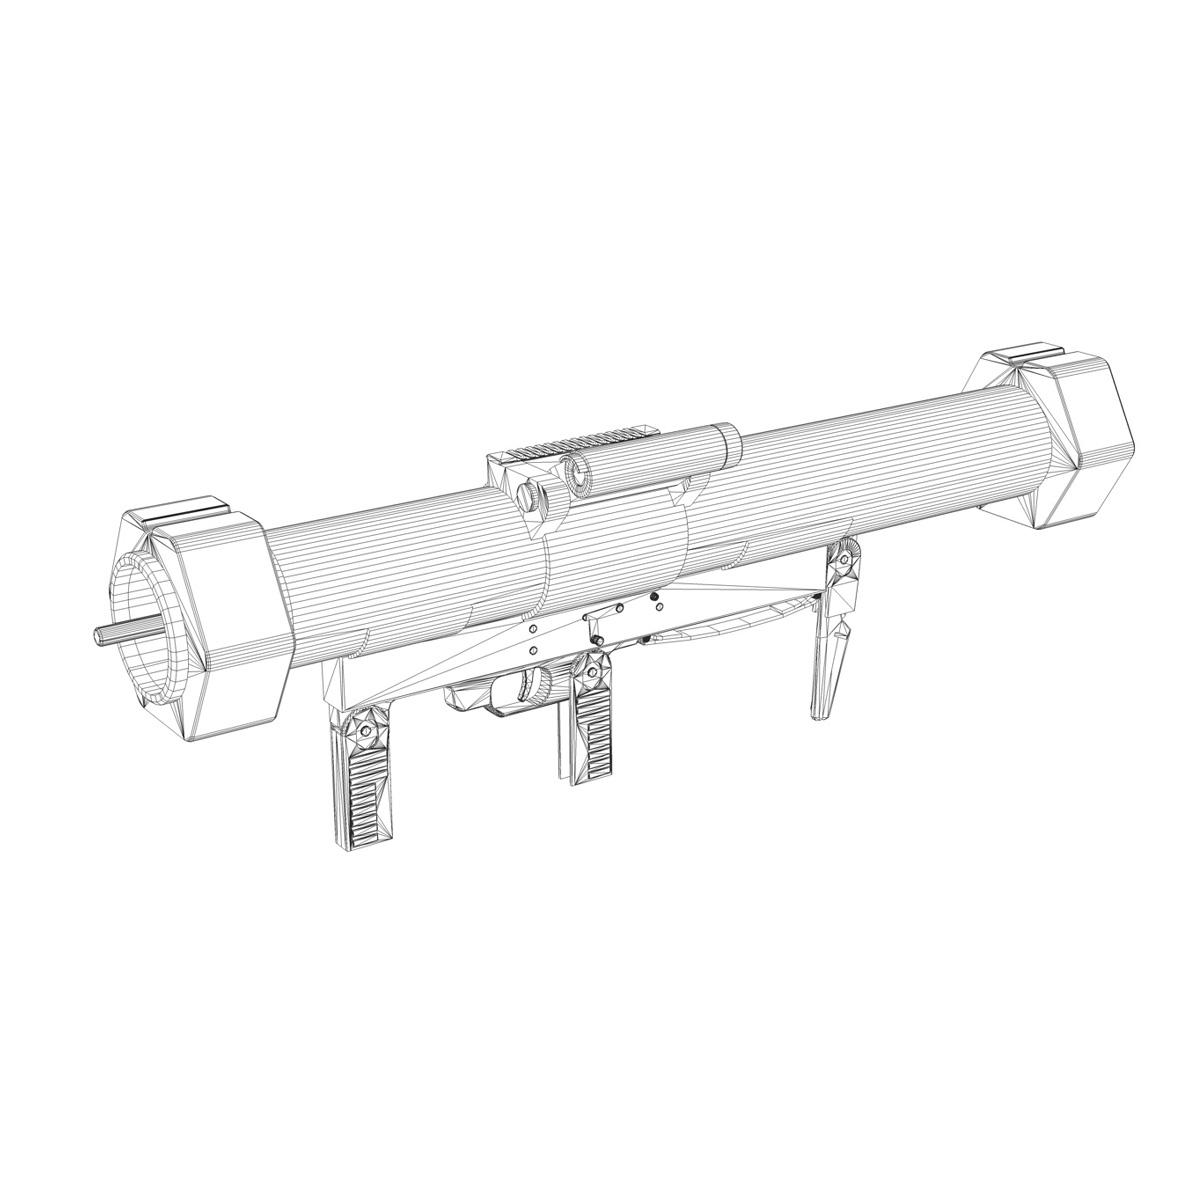 эсрэг хуяг Launcher Matador 3d загвар 3ds fbx c4d lwo obj 197077